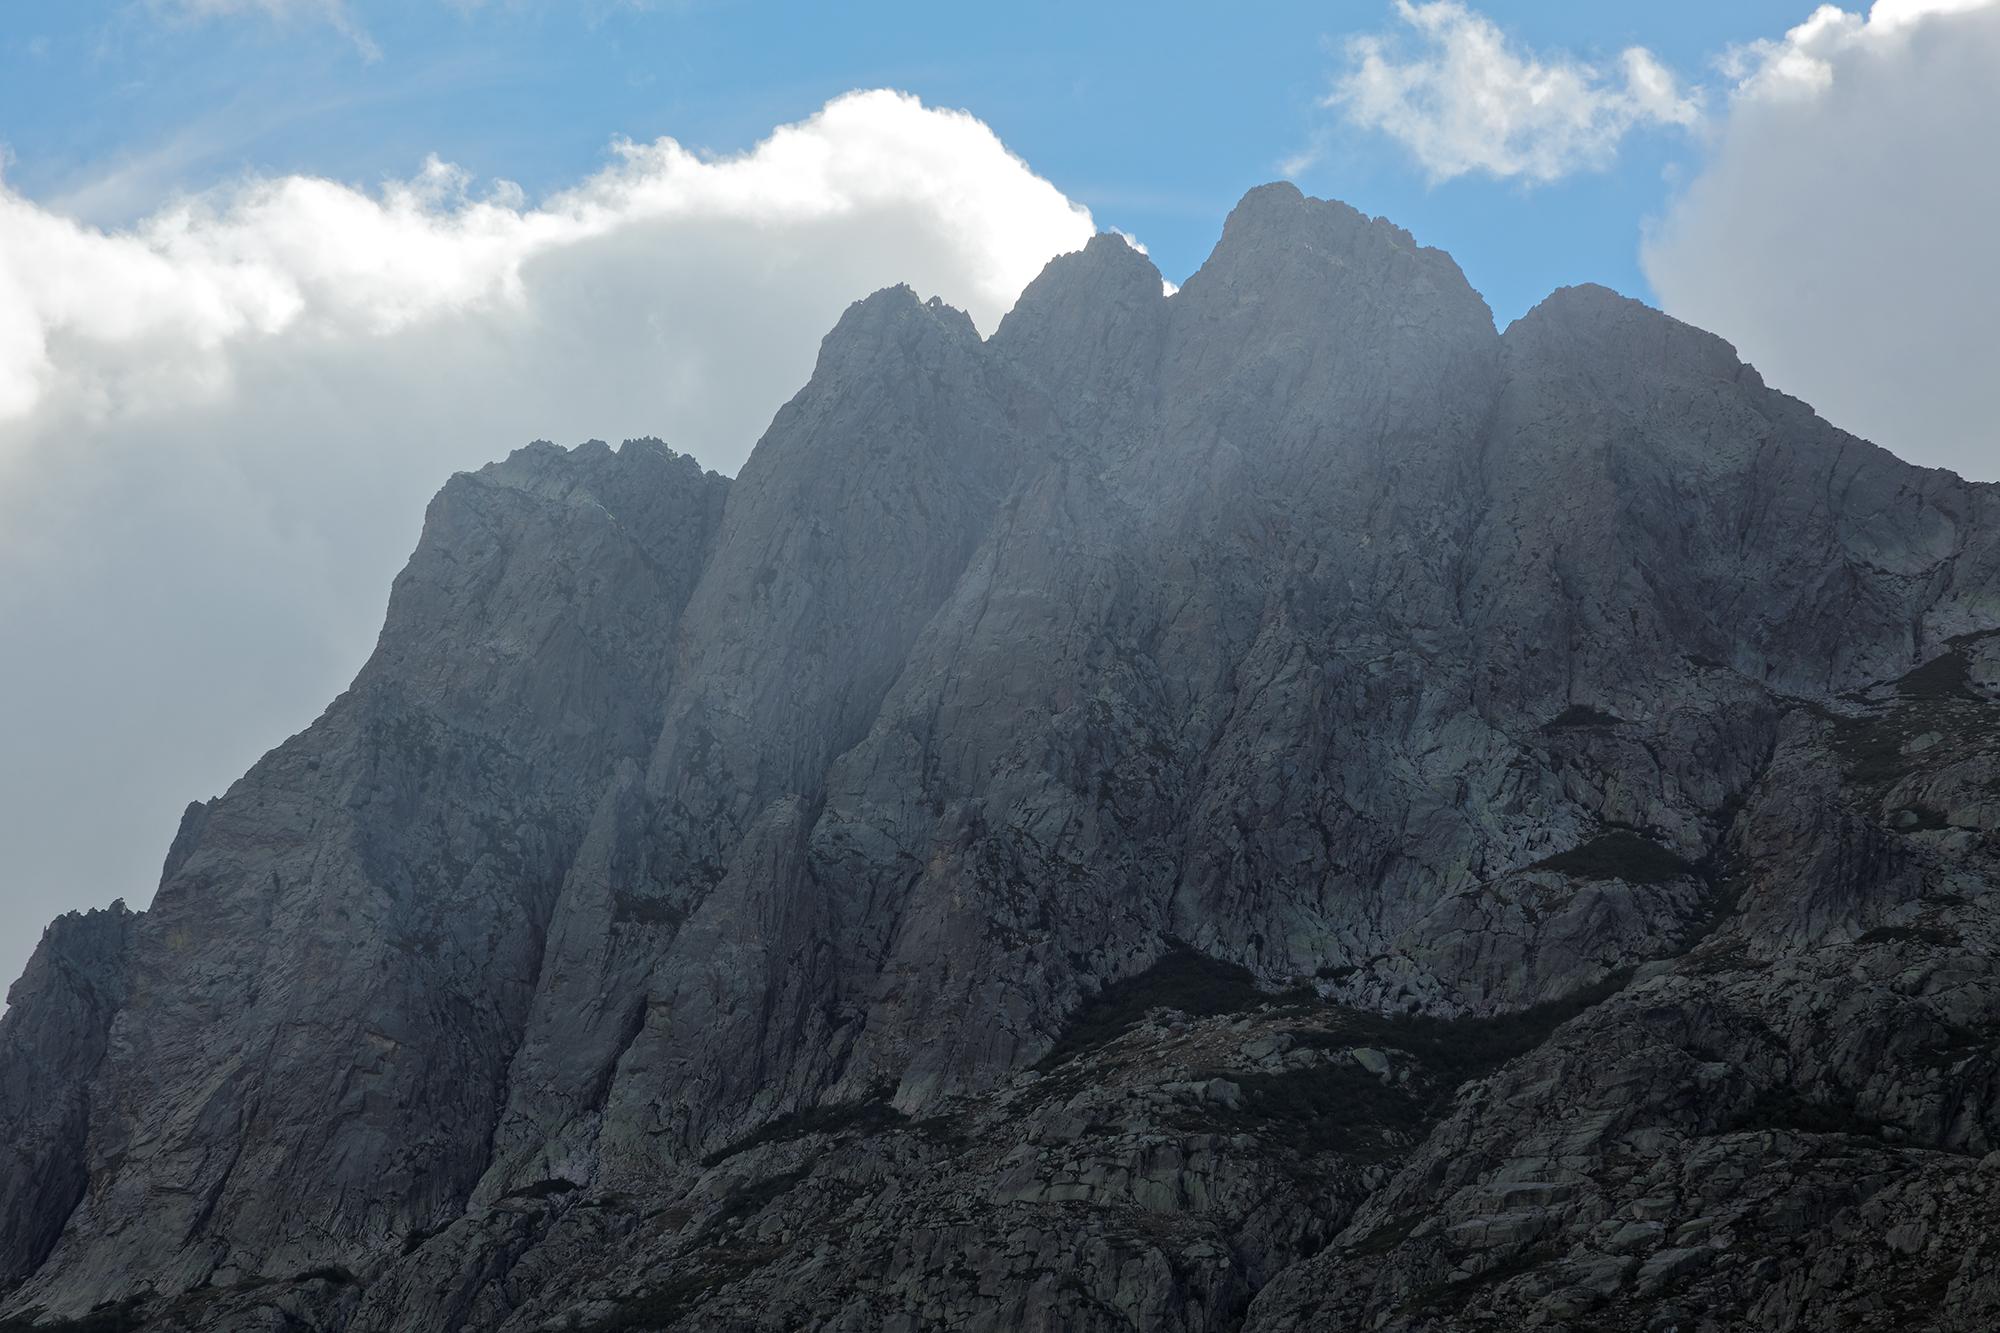 Monte Lombarduccio, 2261 mètres d'altitude